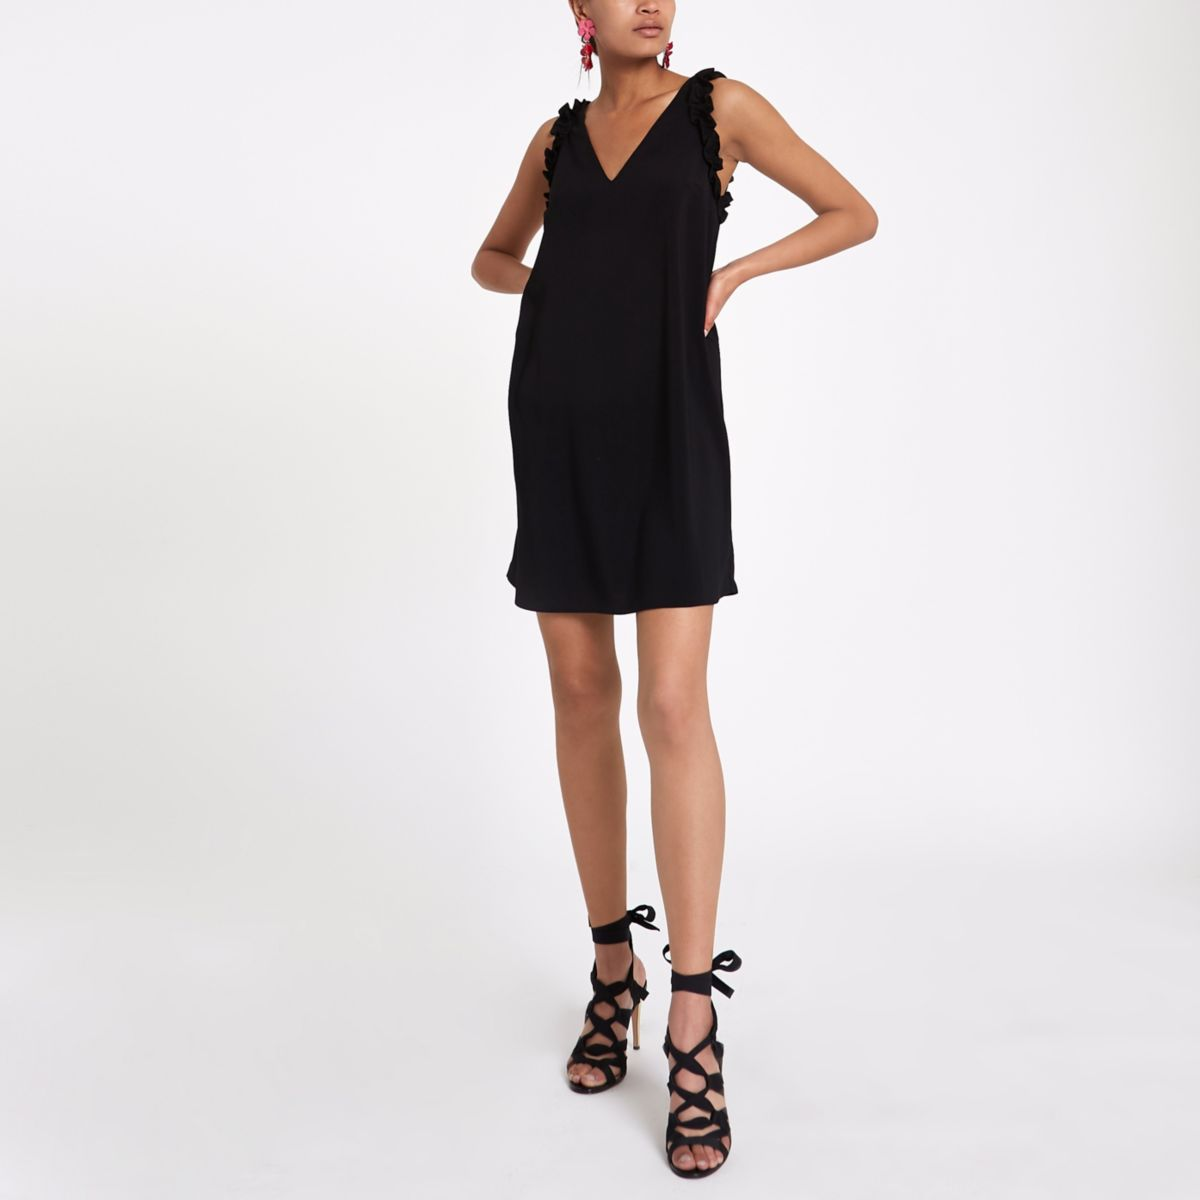 Black frill sleeveless slip dress